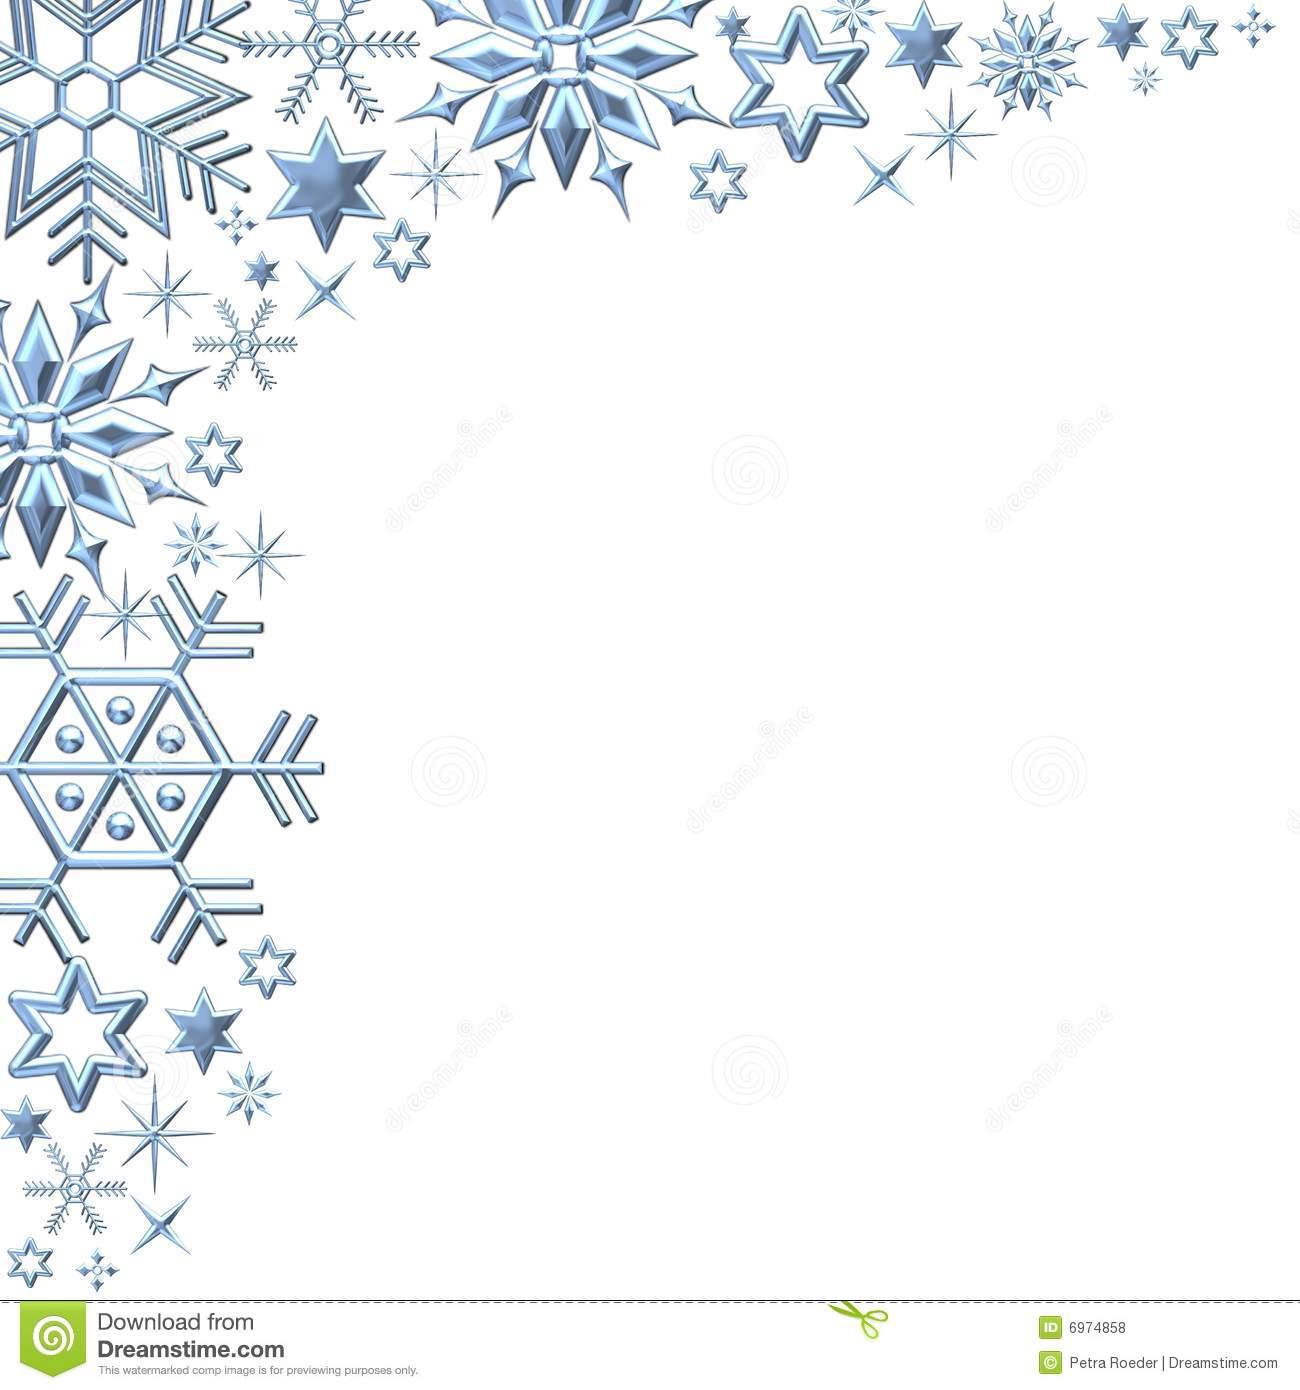 Christmas Snowflakes Borders Clipart - Clipart Kid